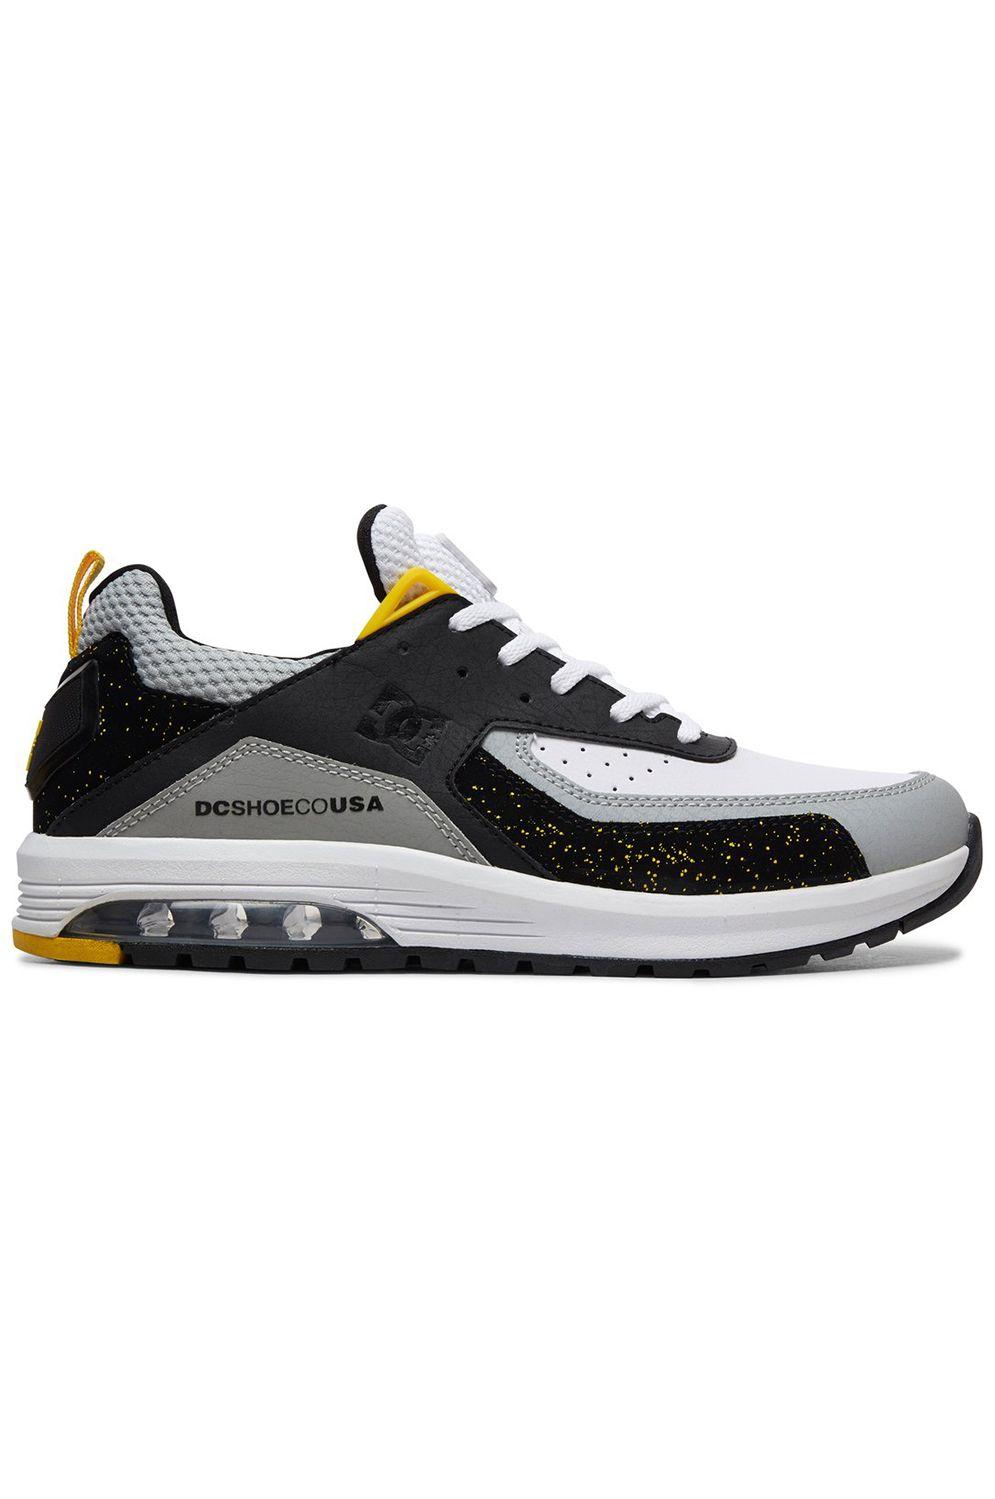 c7d1ac6f005 Tenis DC Shoes VANDIUM SE BLACK GREY YELLOW